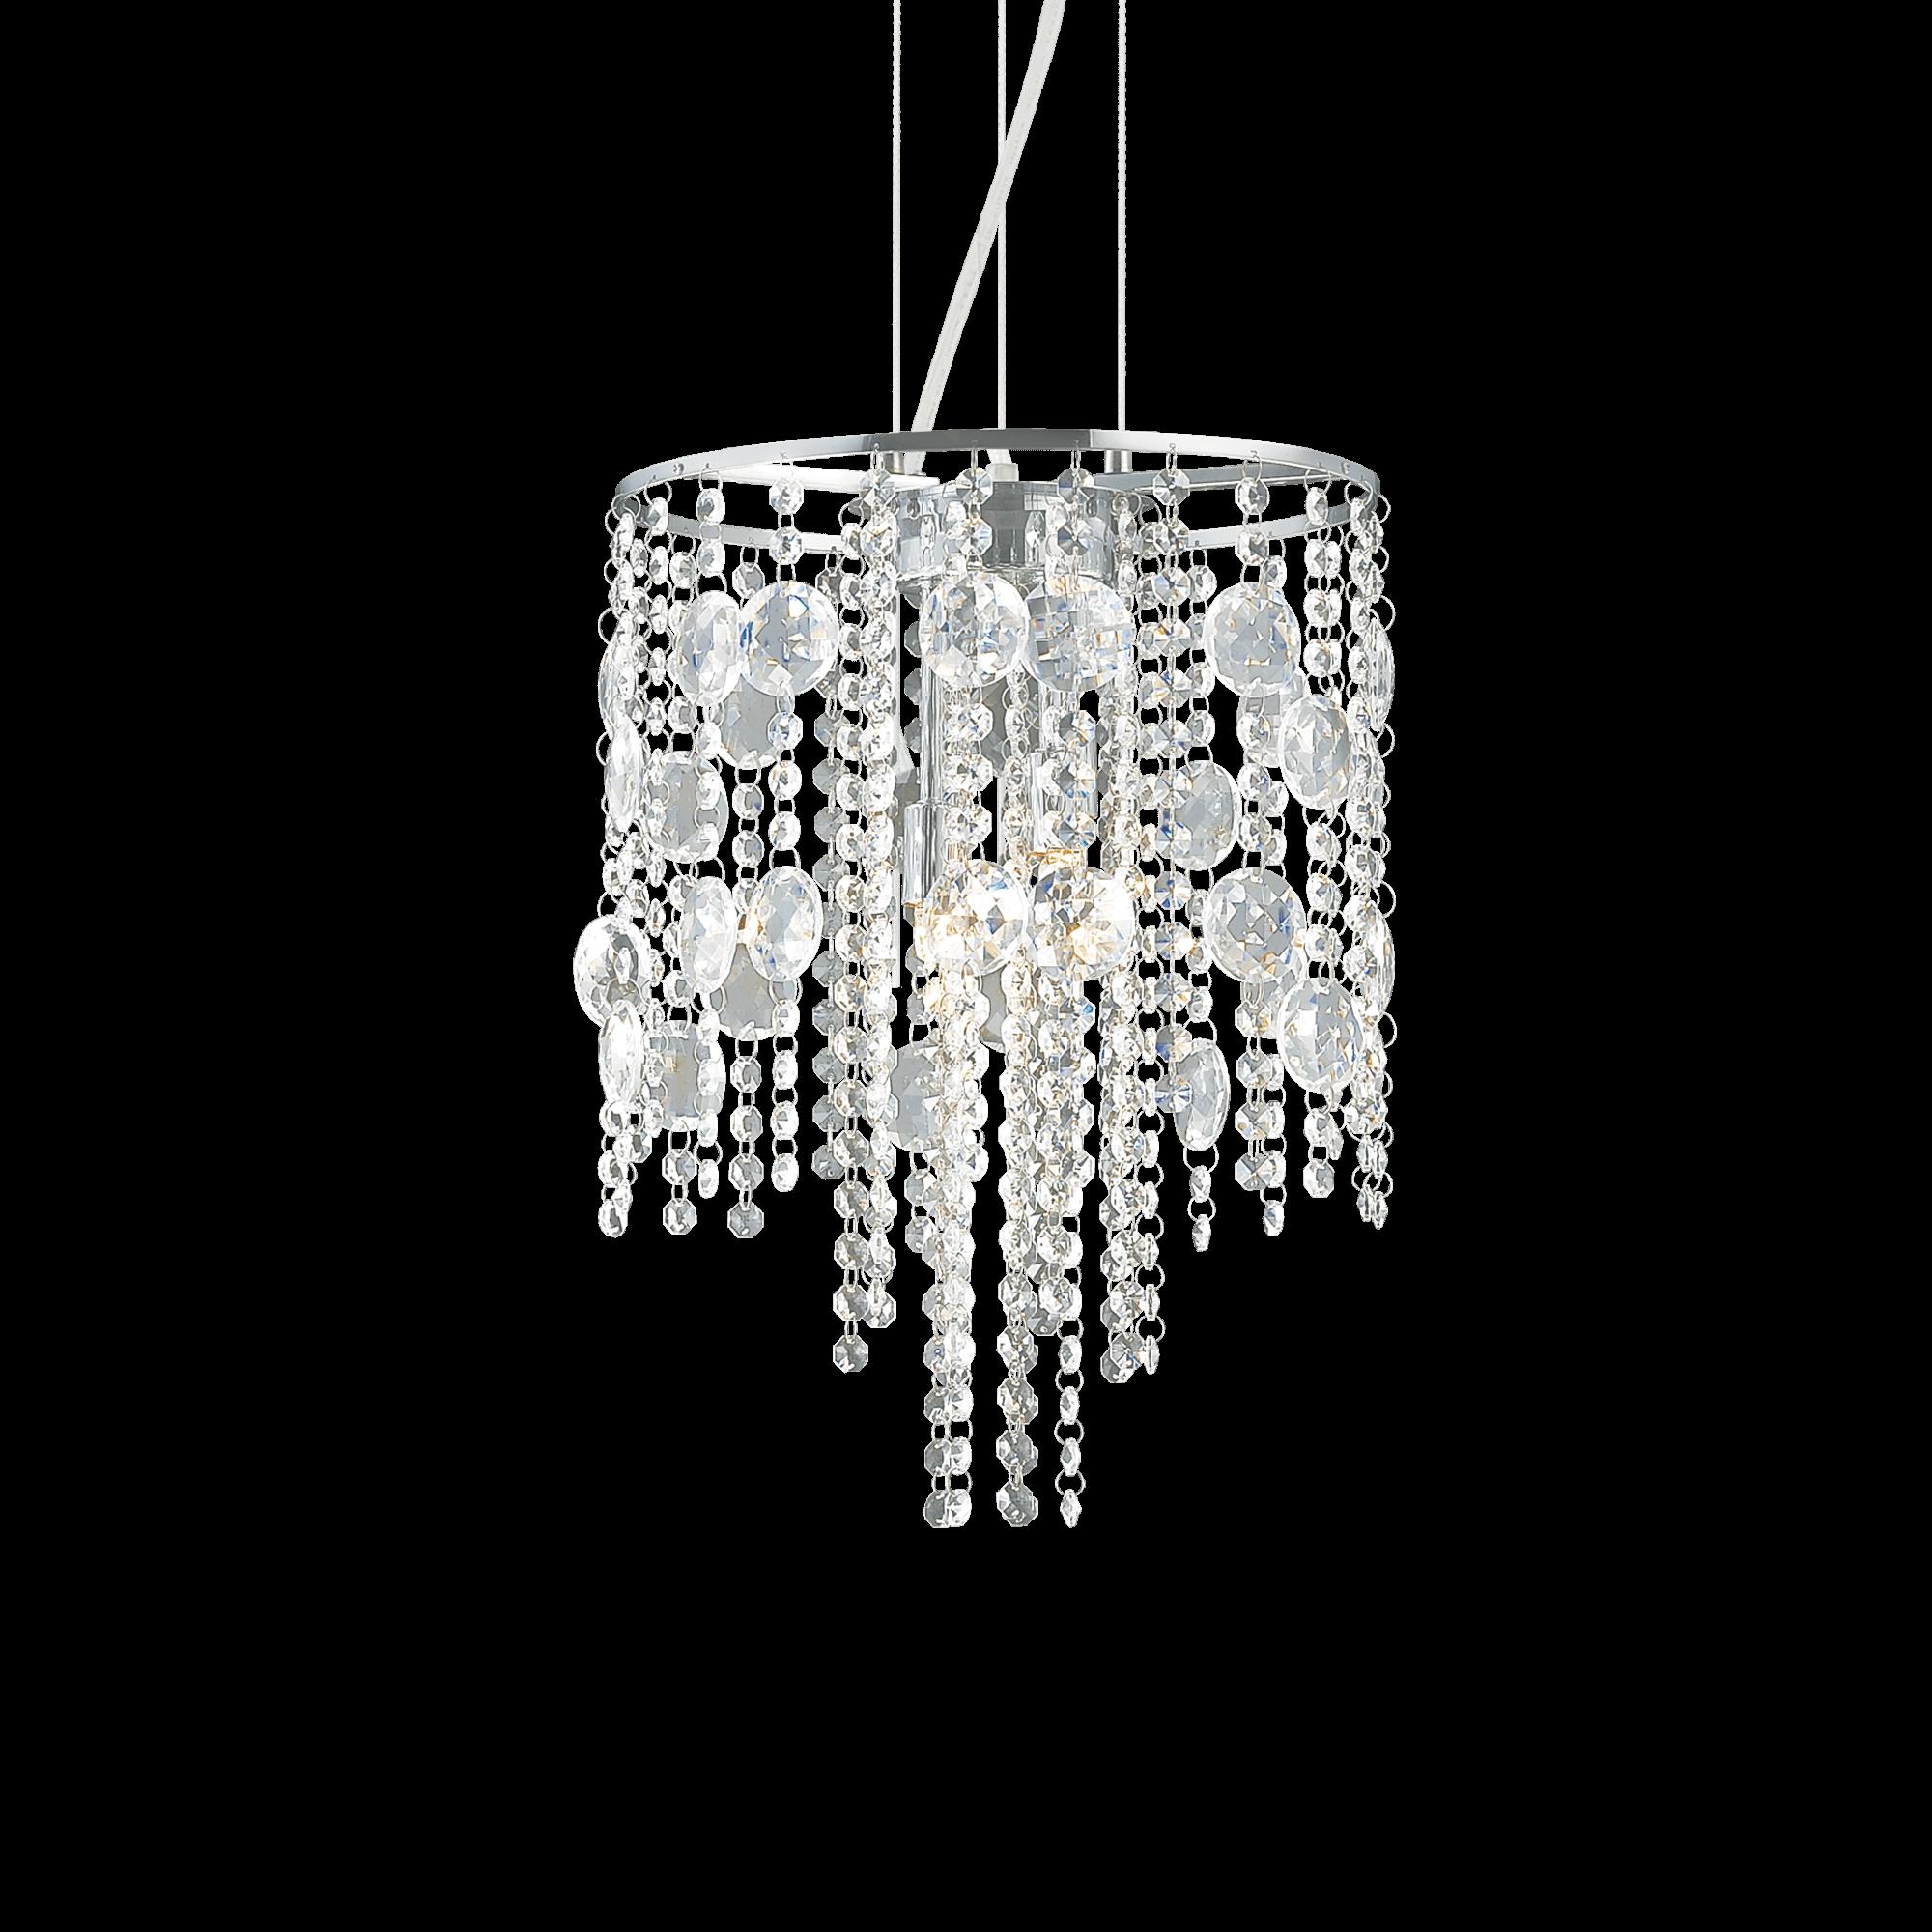 Ideal Lux 062211 Evasione SP4 kristály függeszték